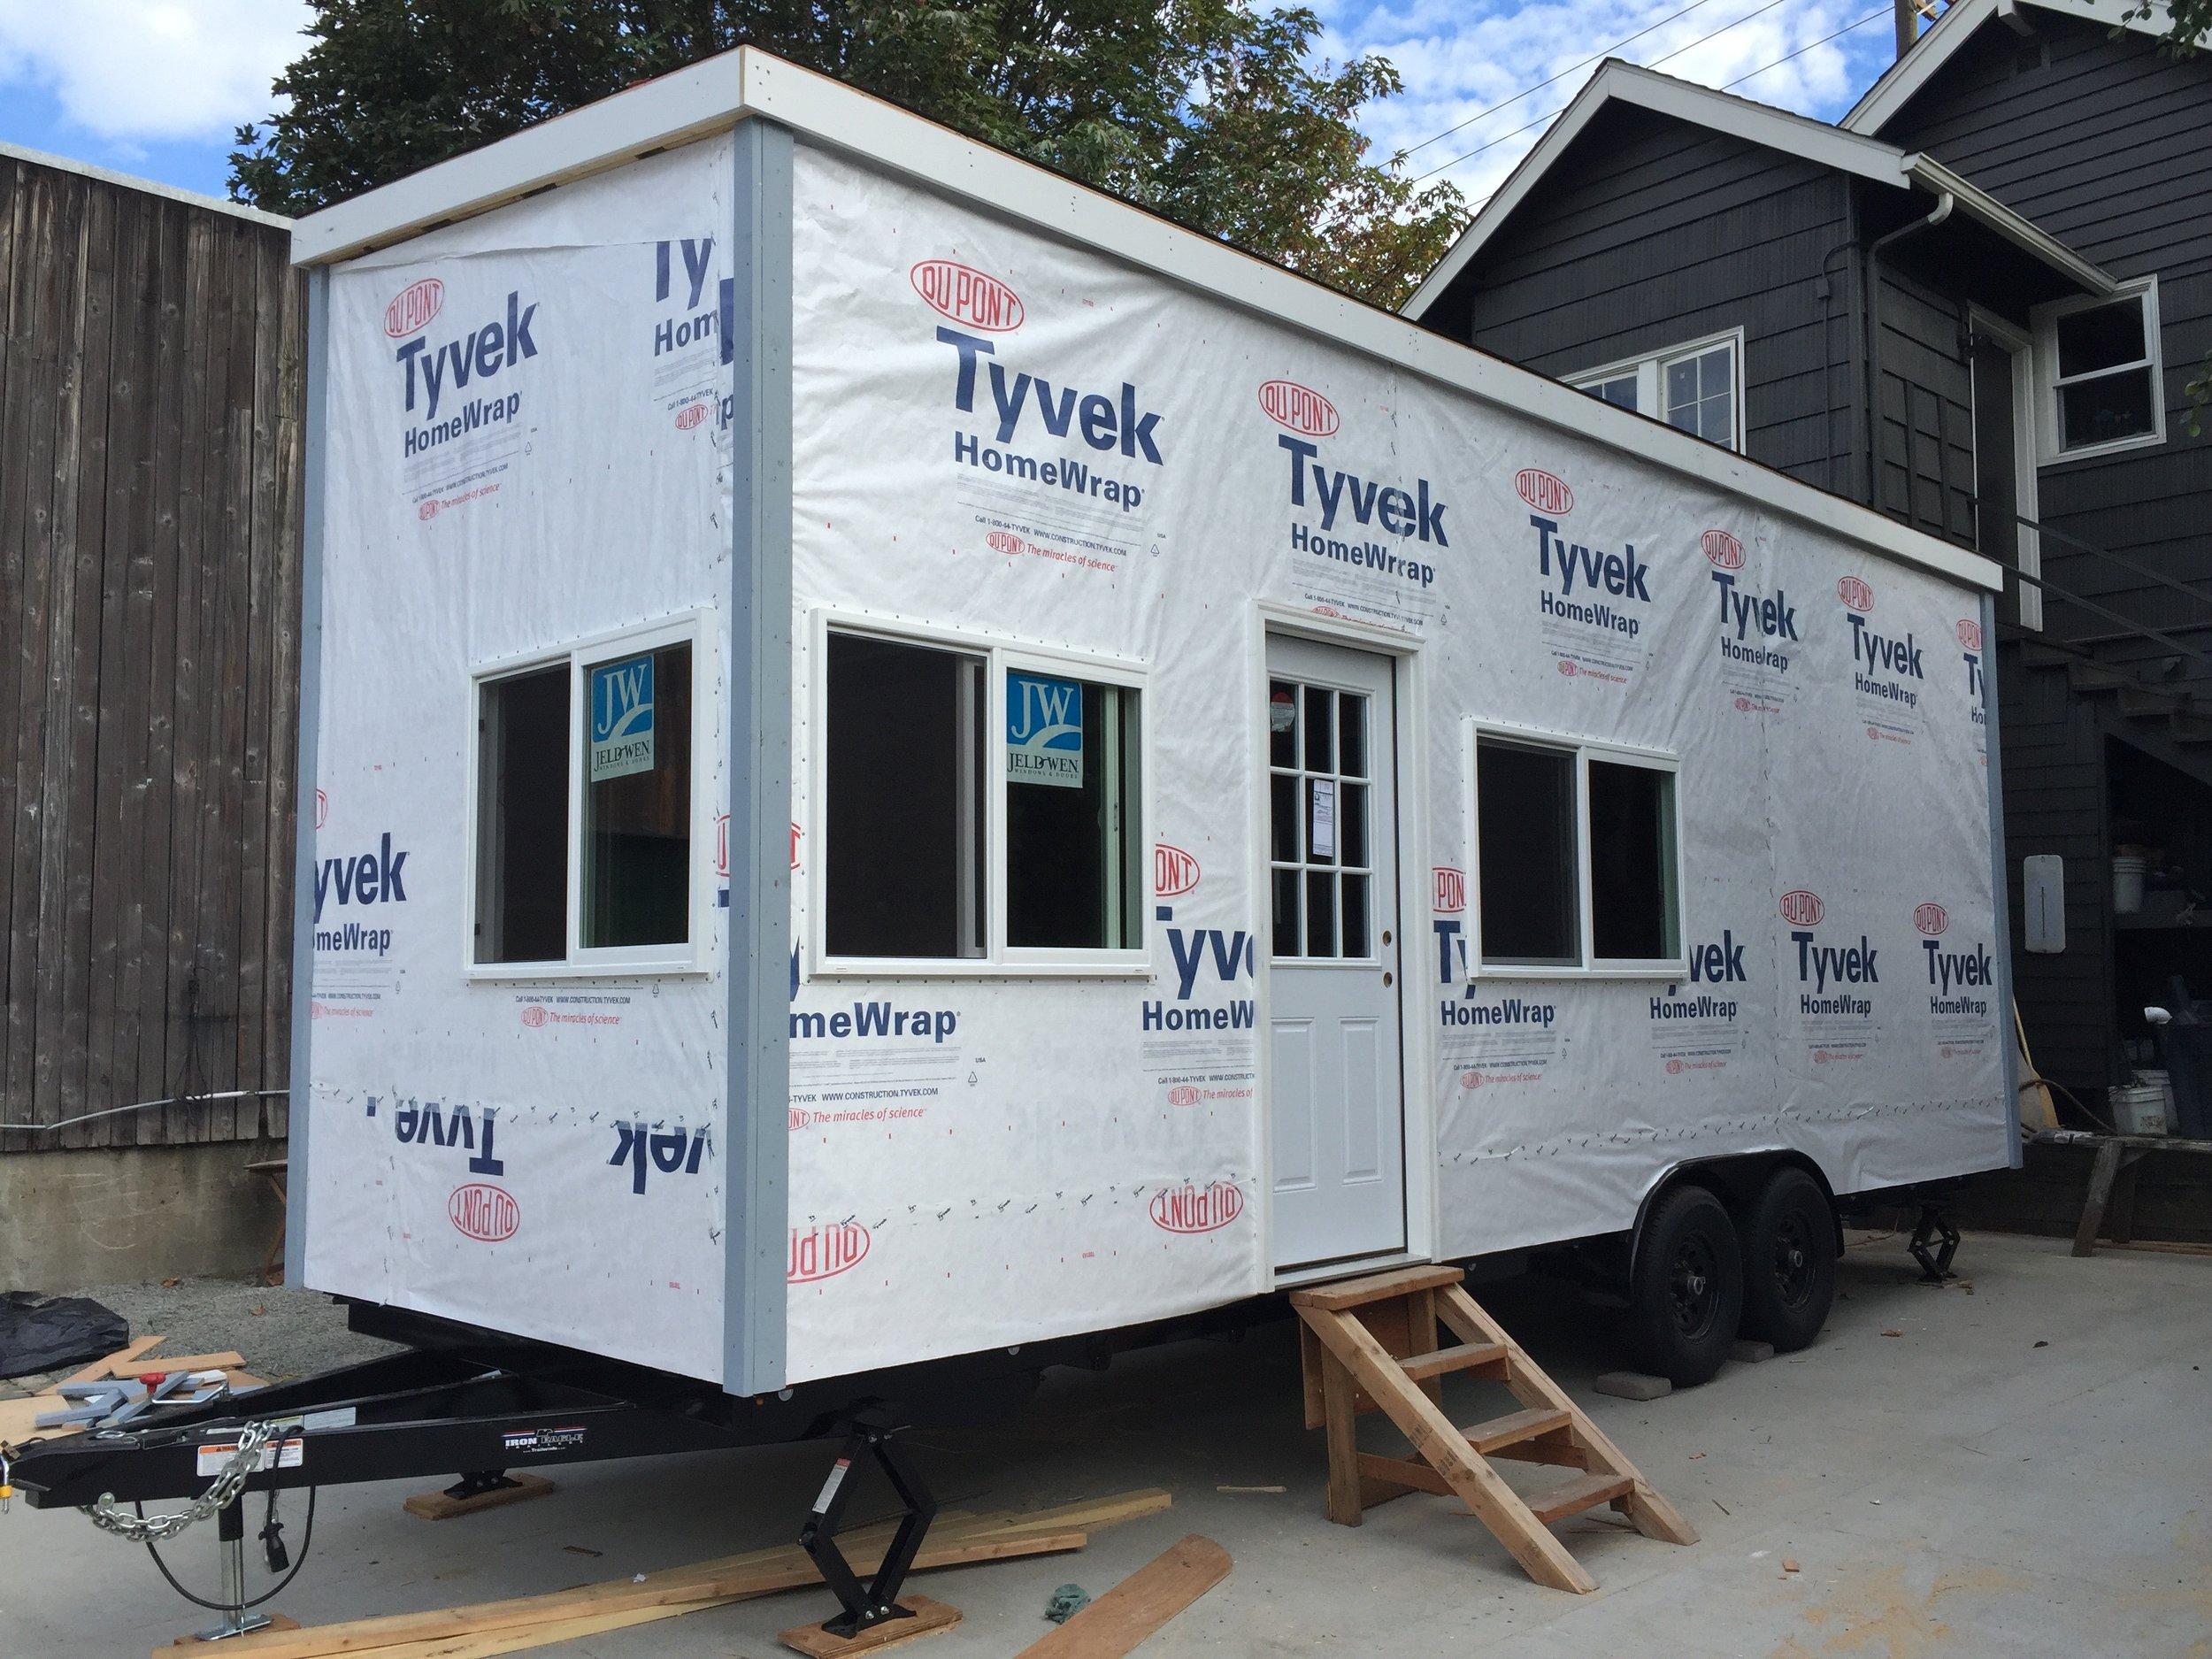 Tyvek house wrap keeps house comfortable